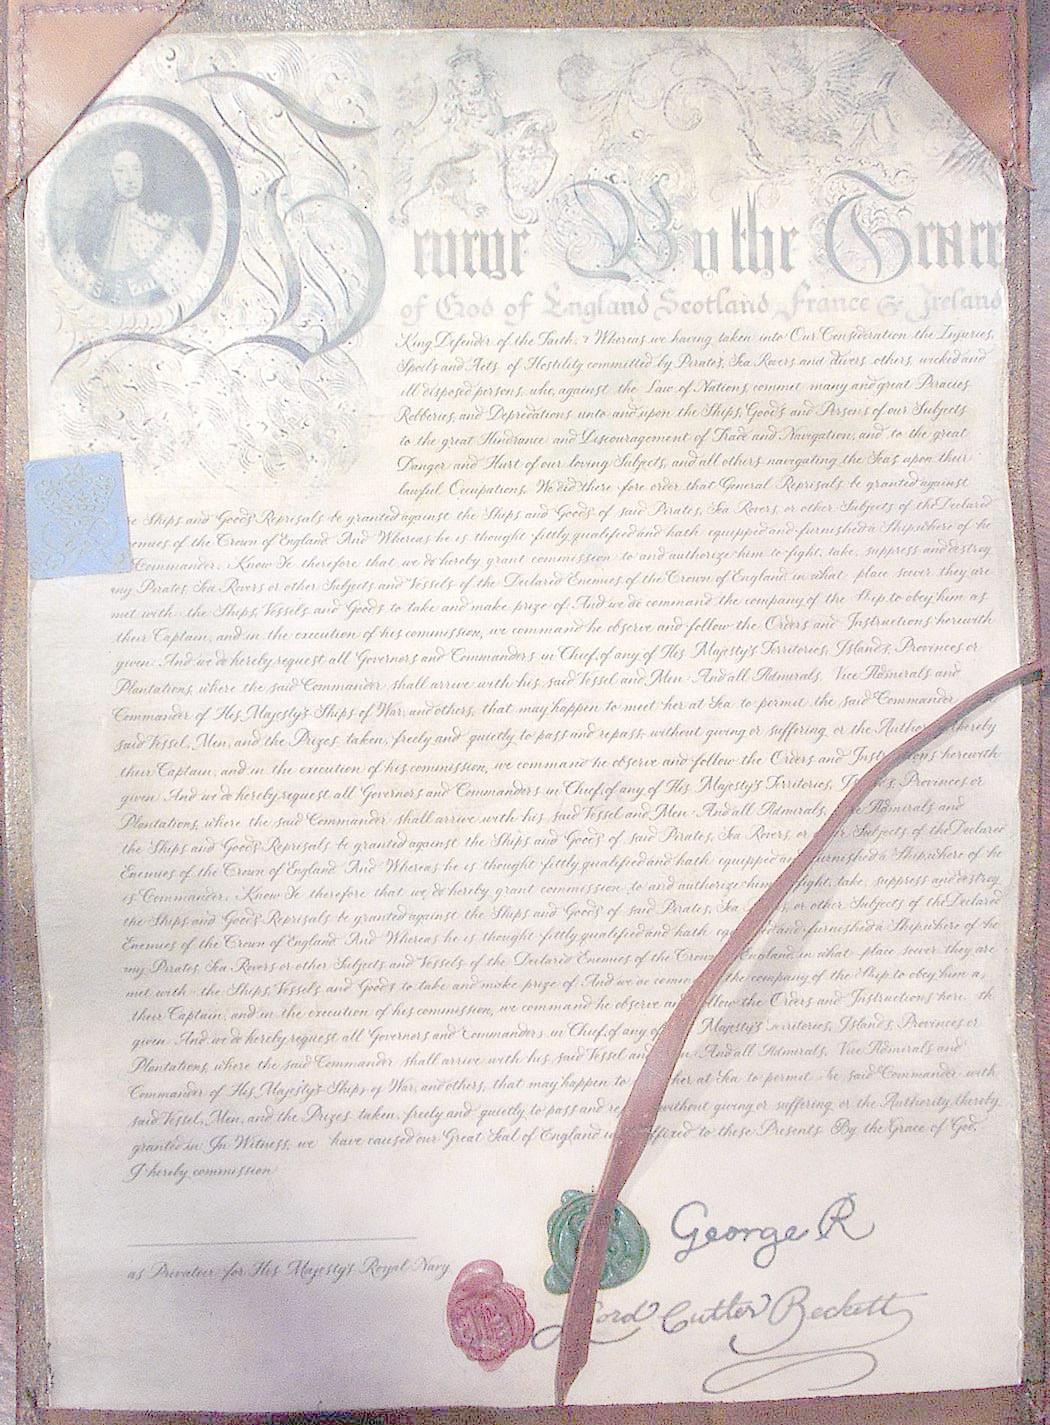 Letters of Marque | PotC Wiki | FANDOM powered by Wikia